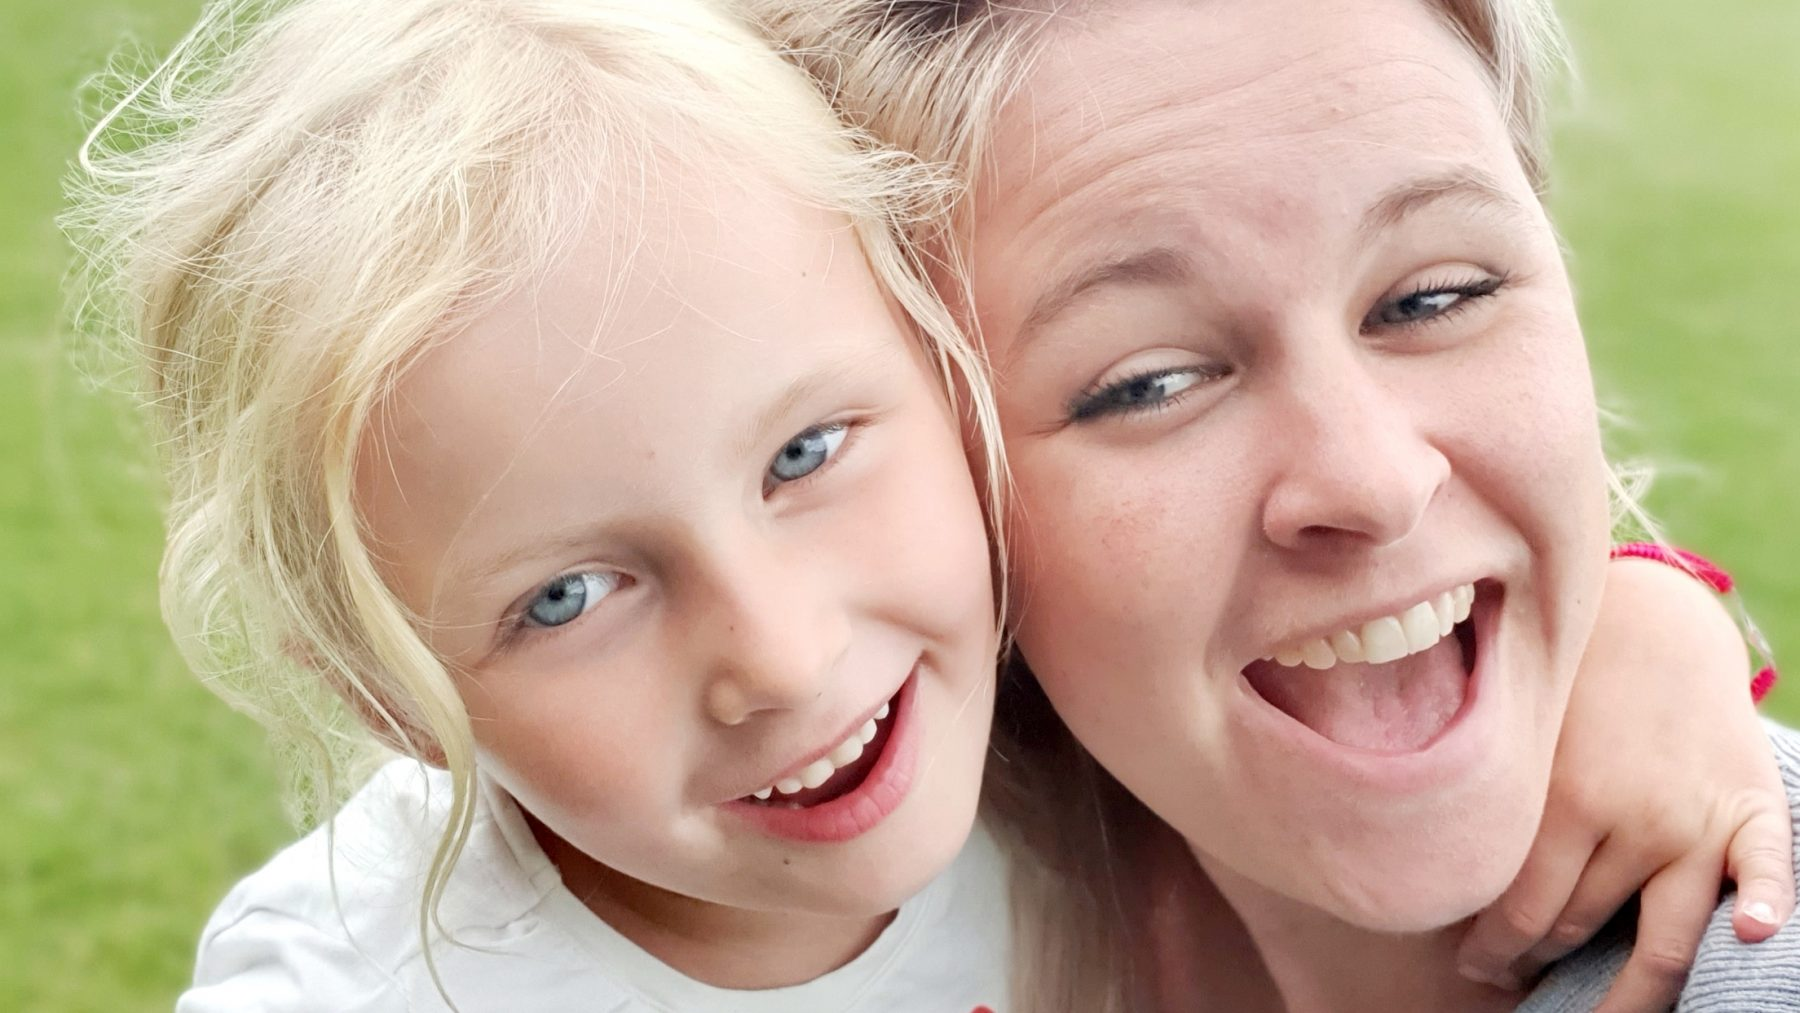 Annelon en Nola - Annelon is moeder met epilepsie